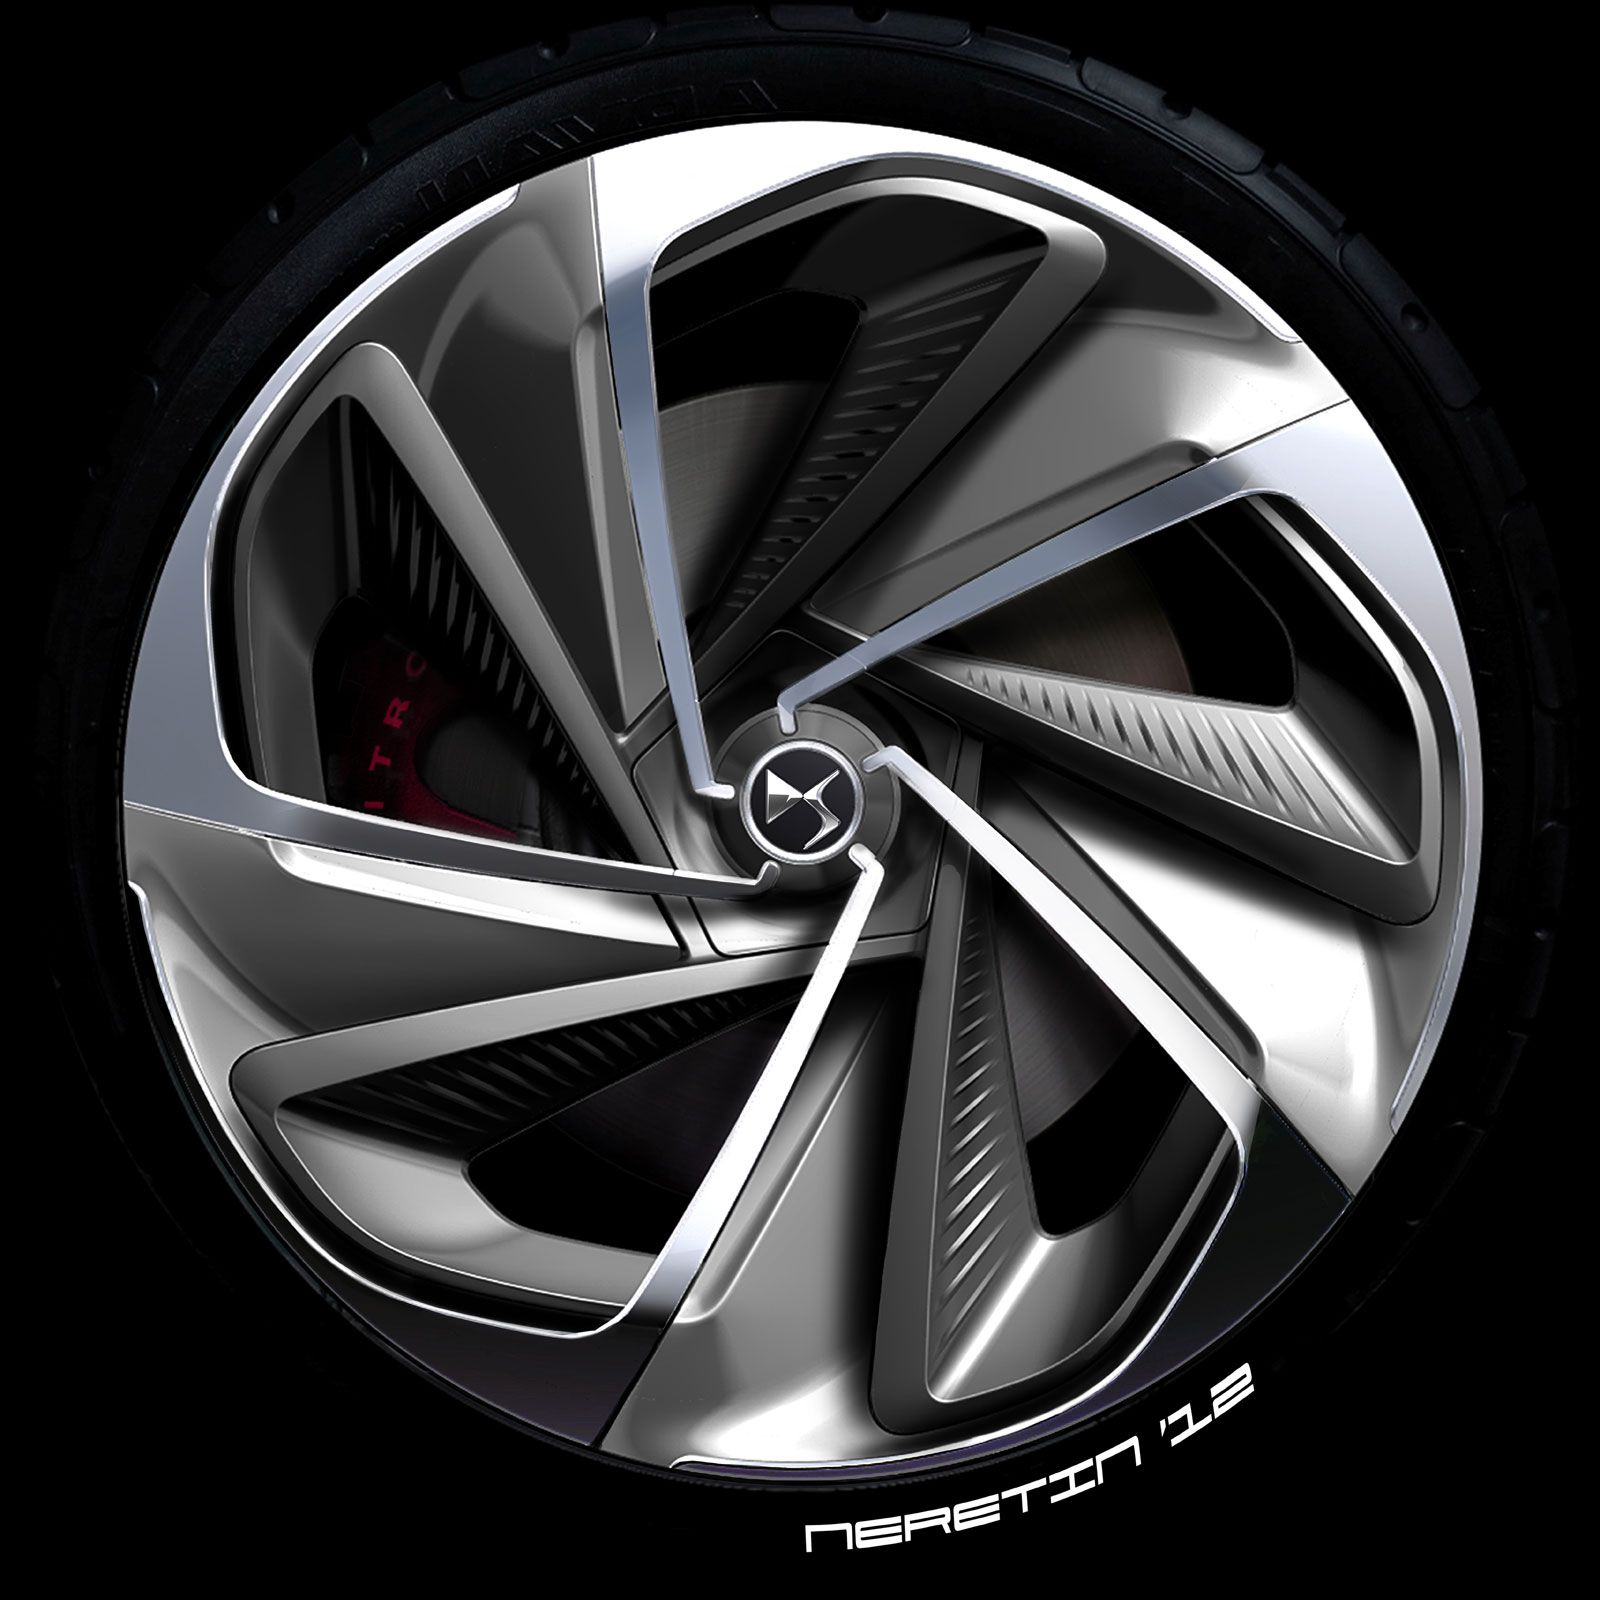 Citroen Numero 9 Concept Wheel Design Sketch | Car Design ...